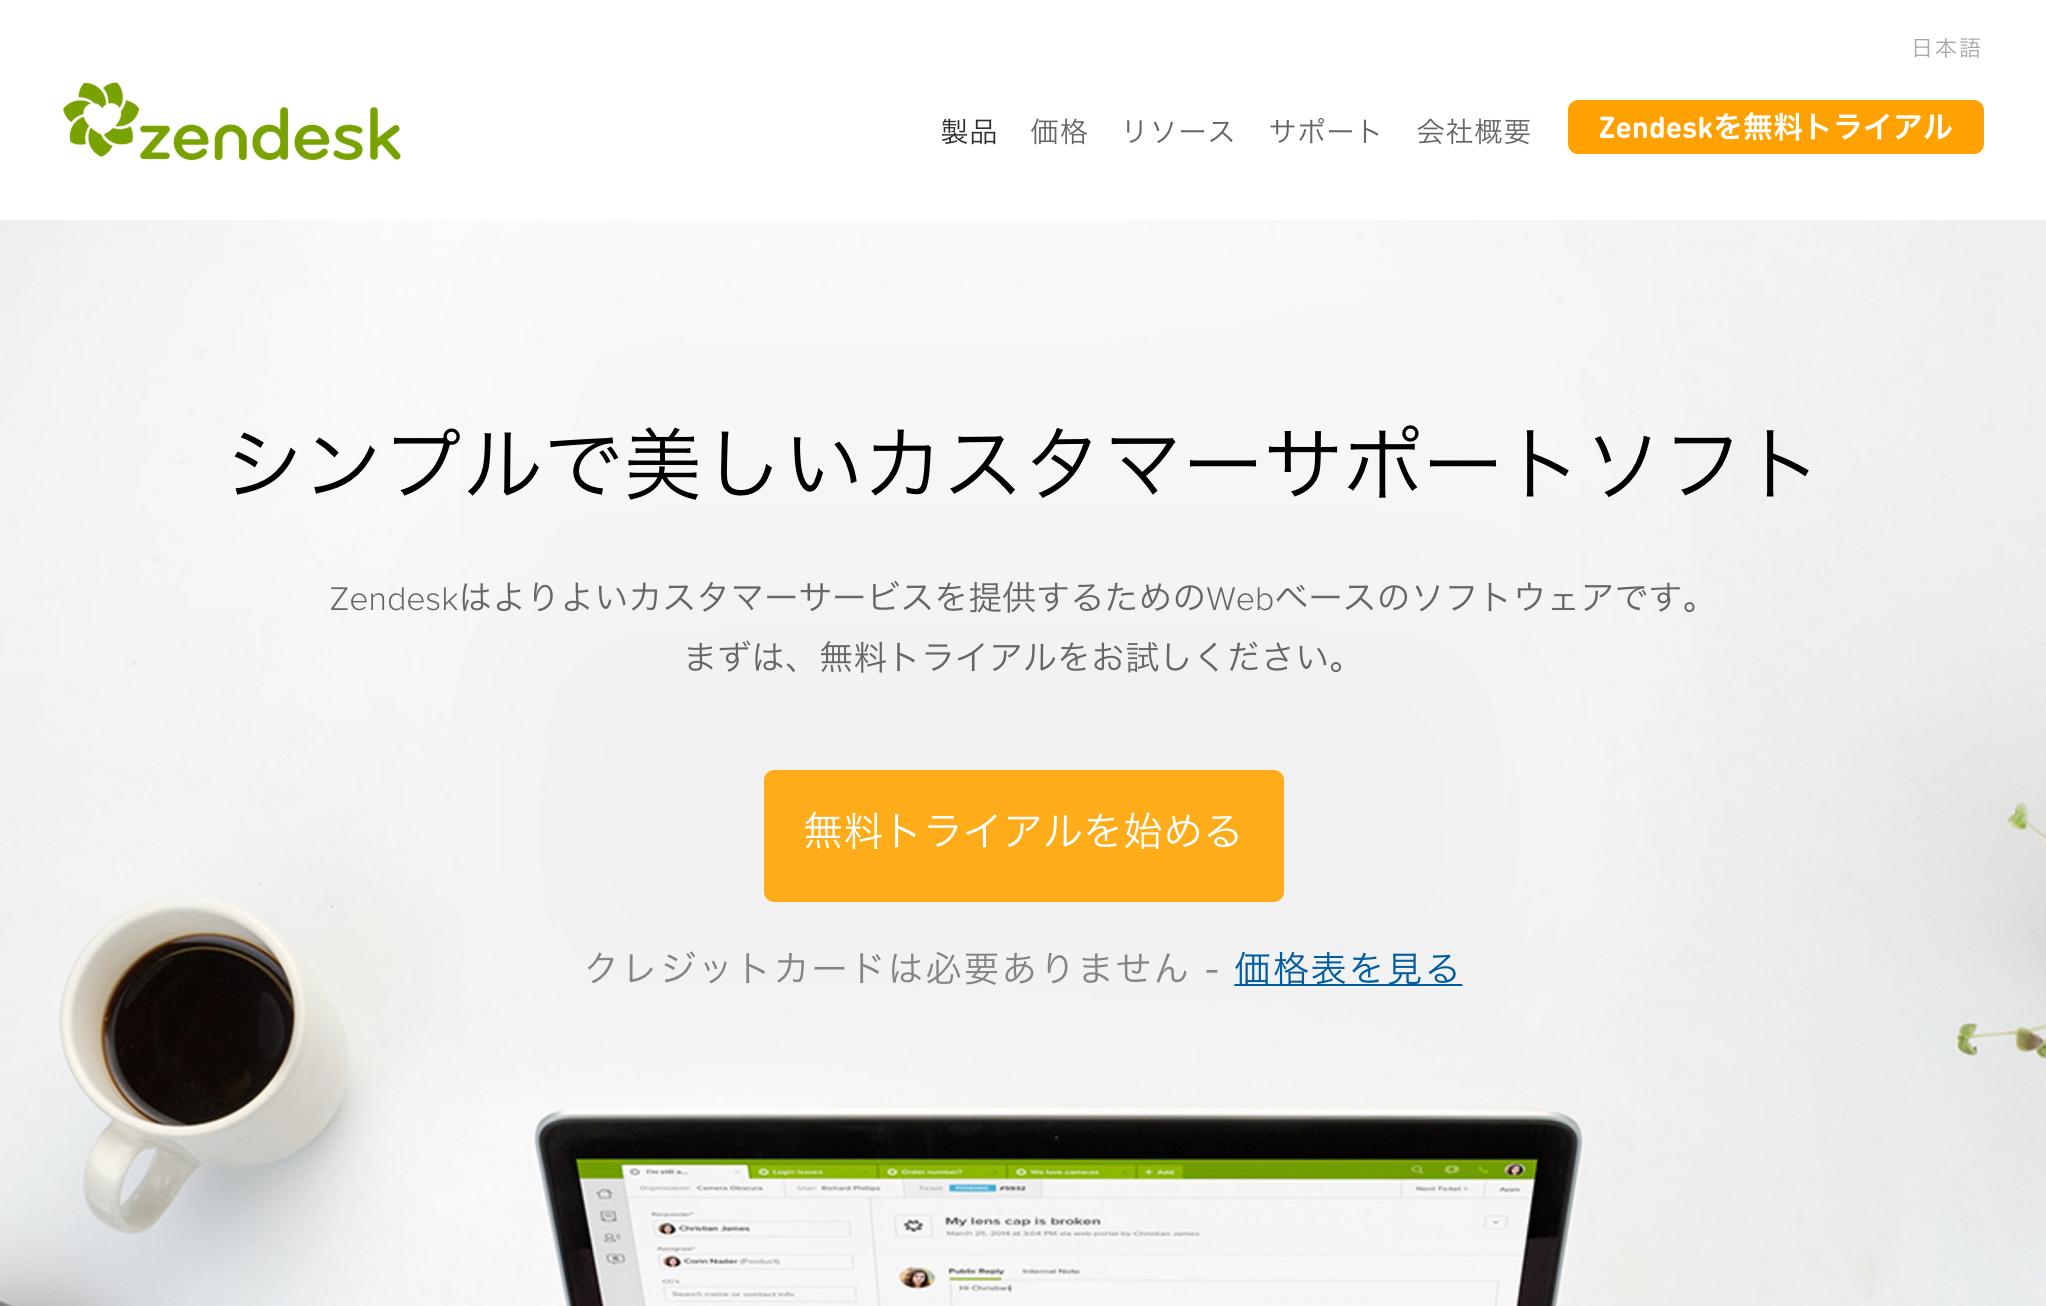 Zendesk Japan   カスタマーサポートソフトウェア   ヘルプデスクシステム.png